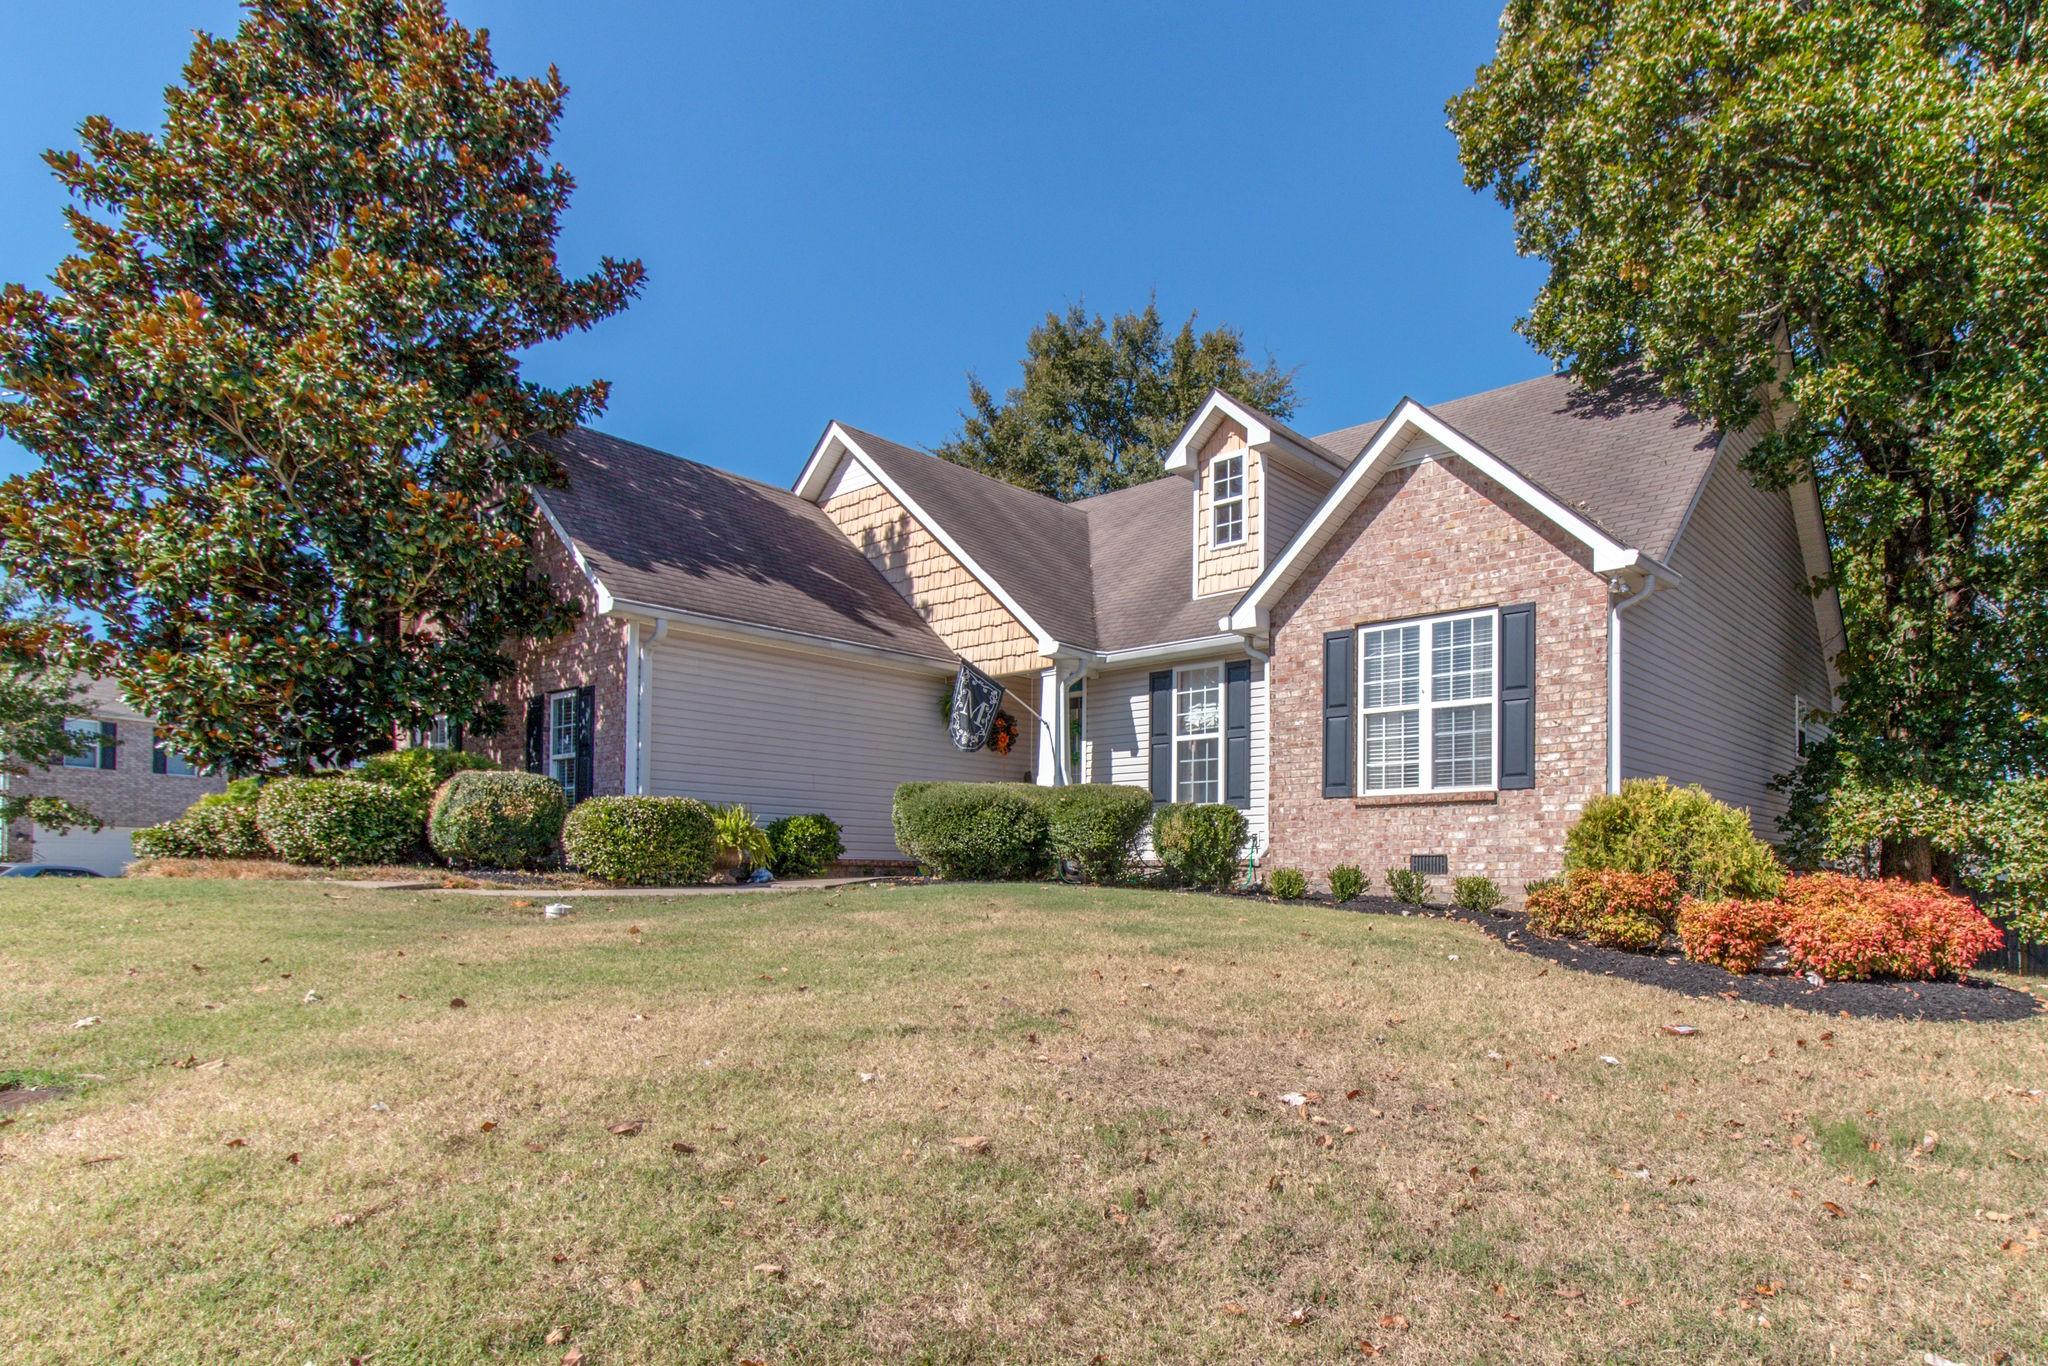 4037 Pineorchard Pl, Antioch, TN 37013 - Antioch, TN real estate listing